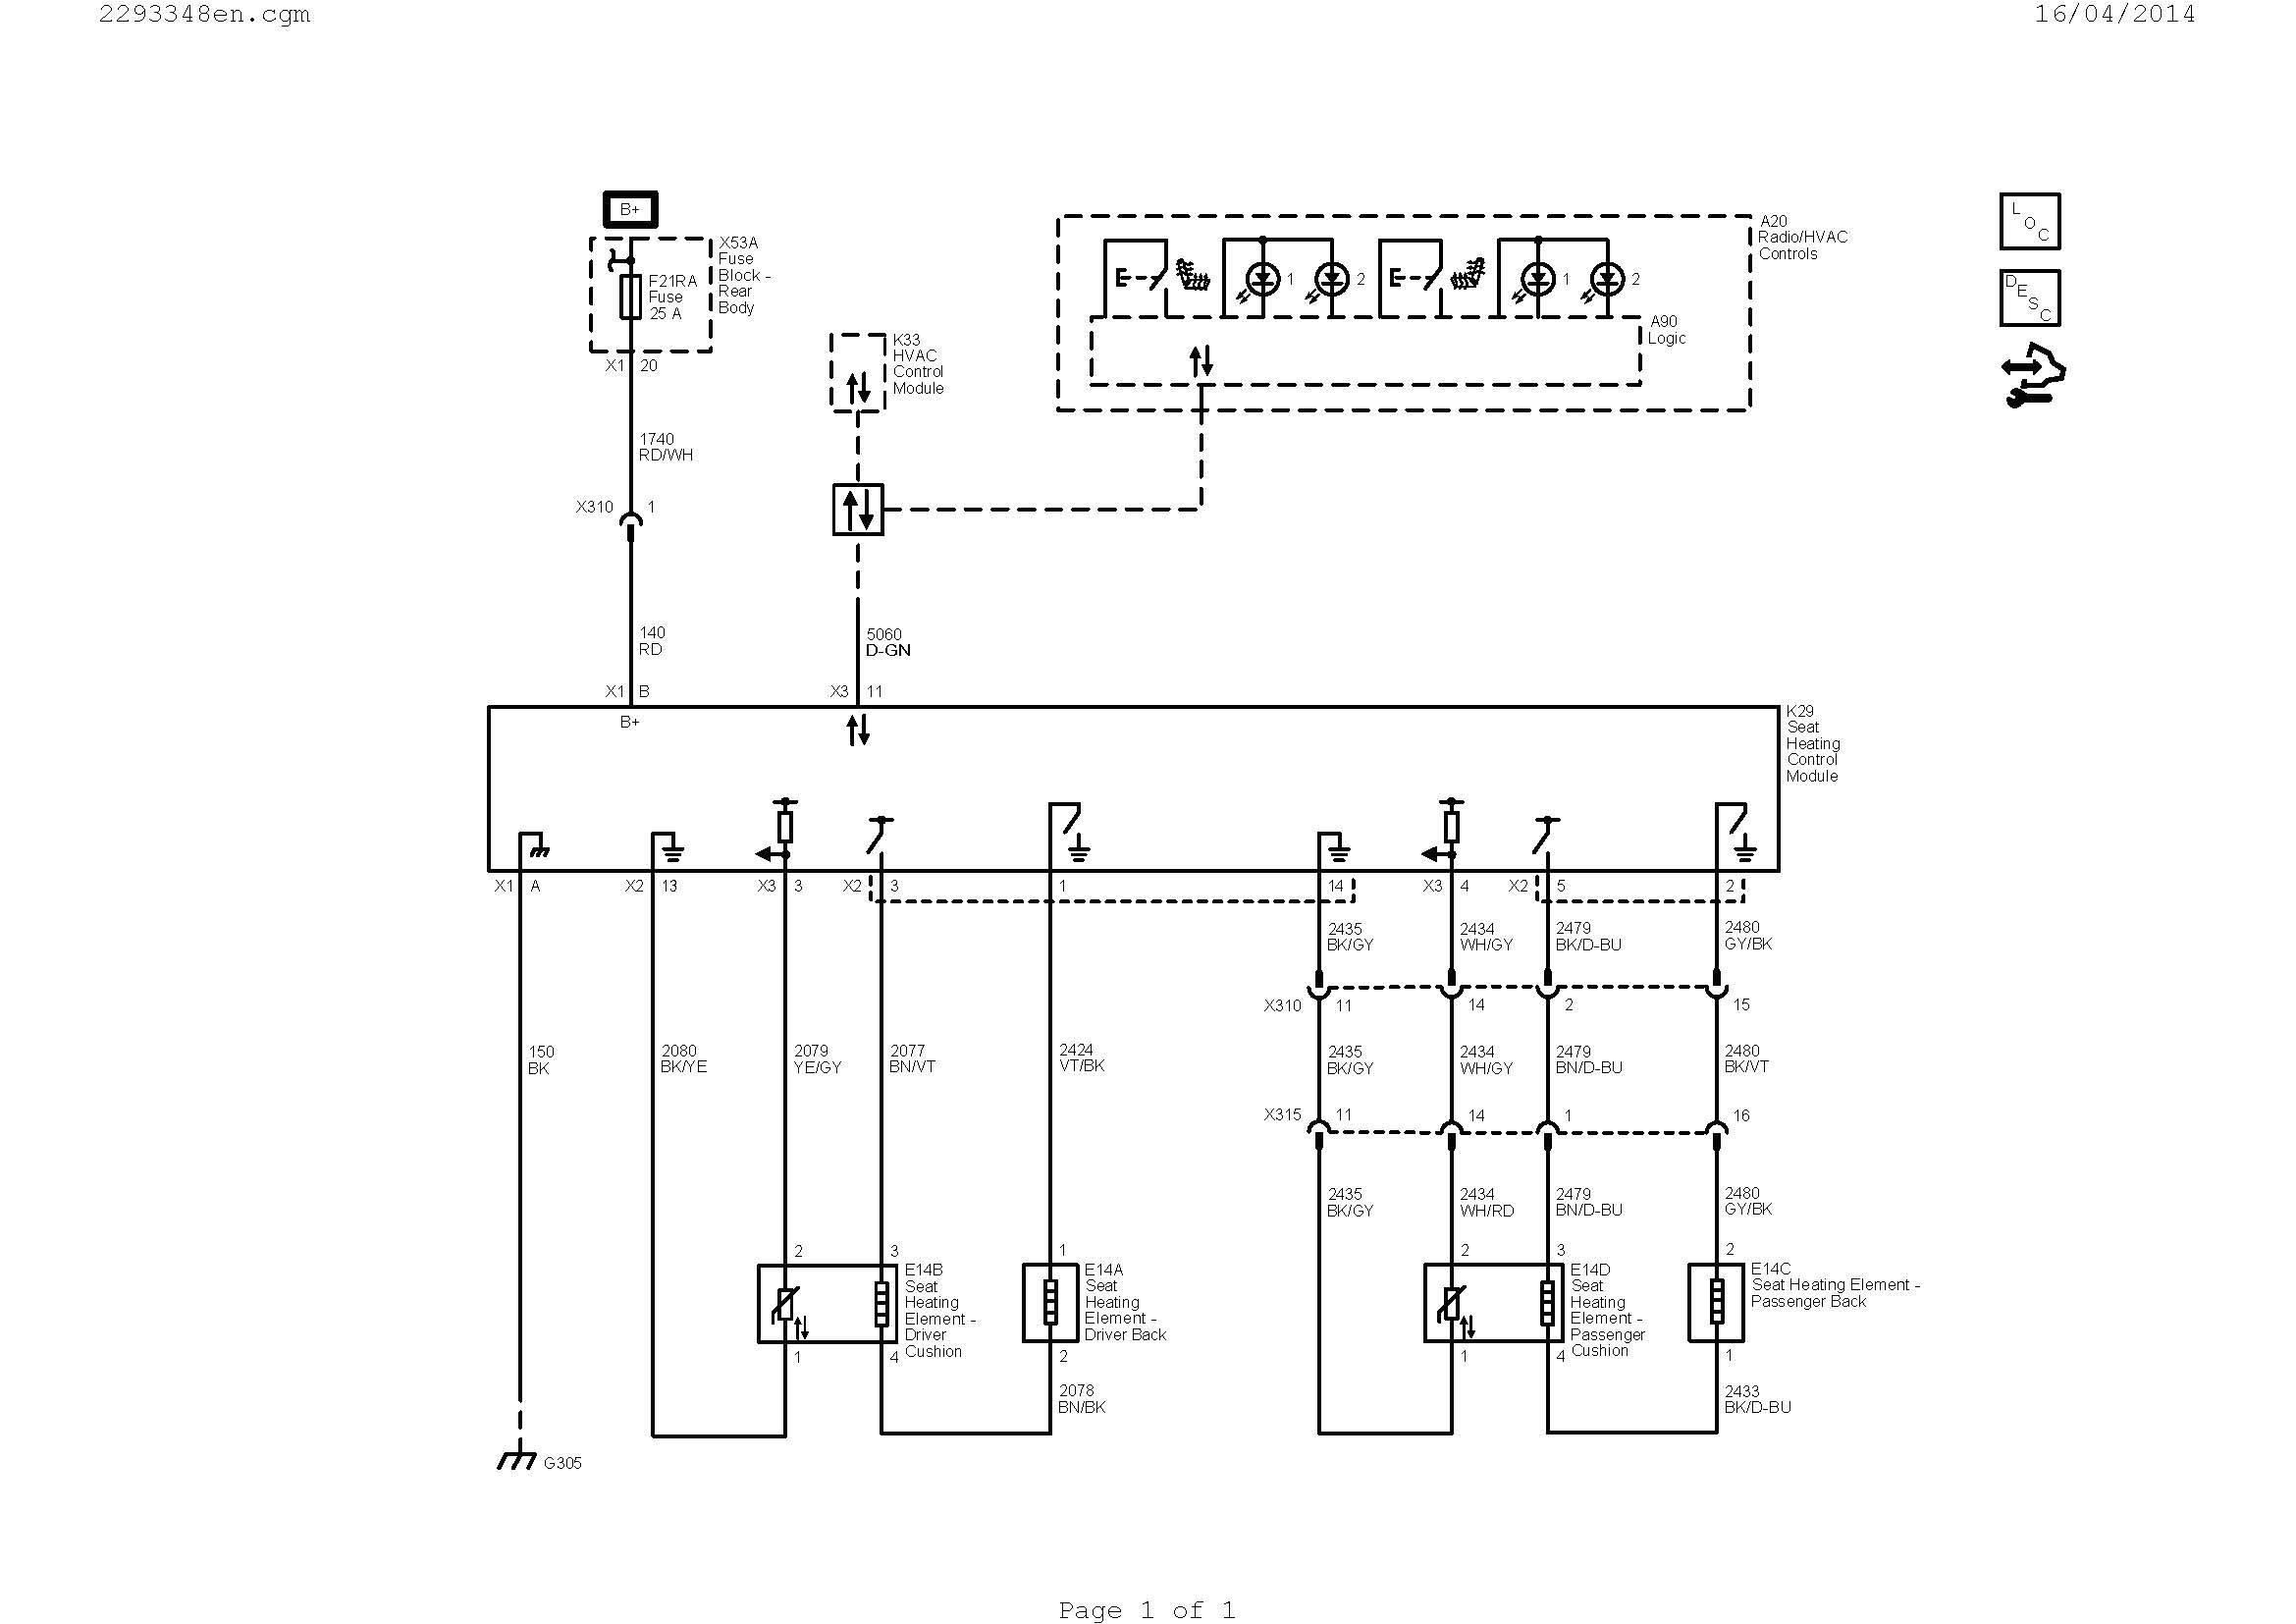 nest humidifier wiring diagram beautiful nest thermostat daikin furnace control wiring schematic